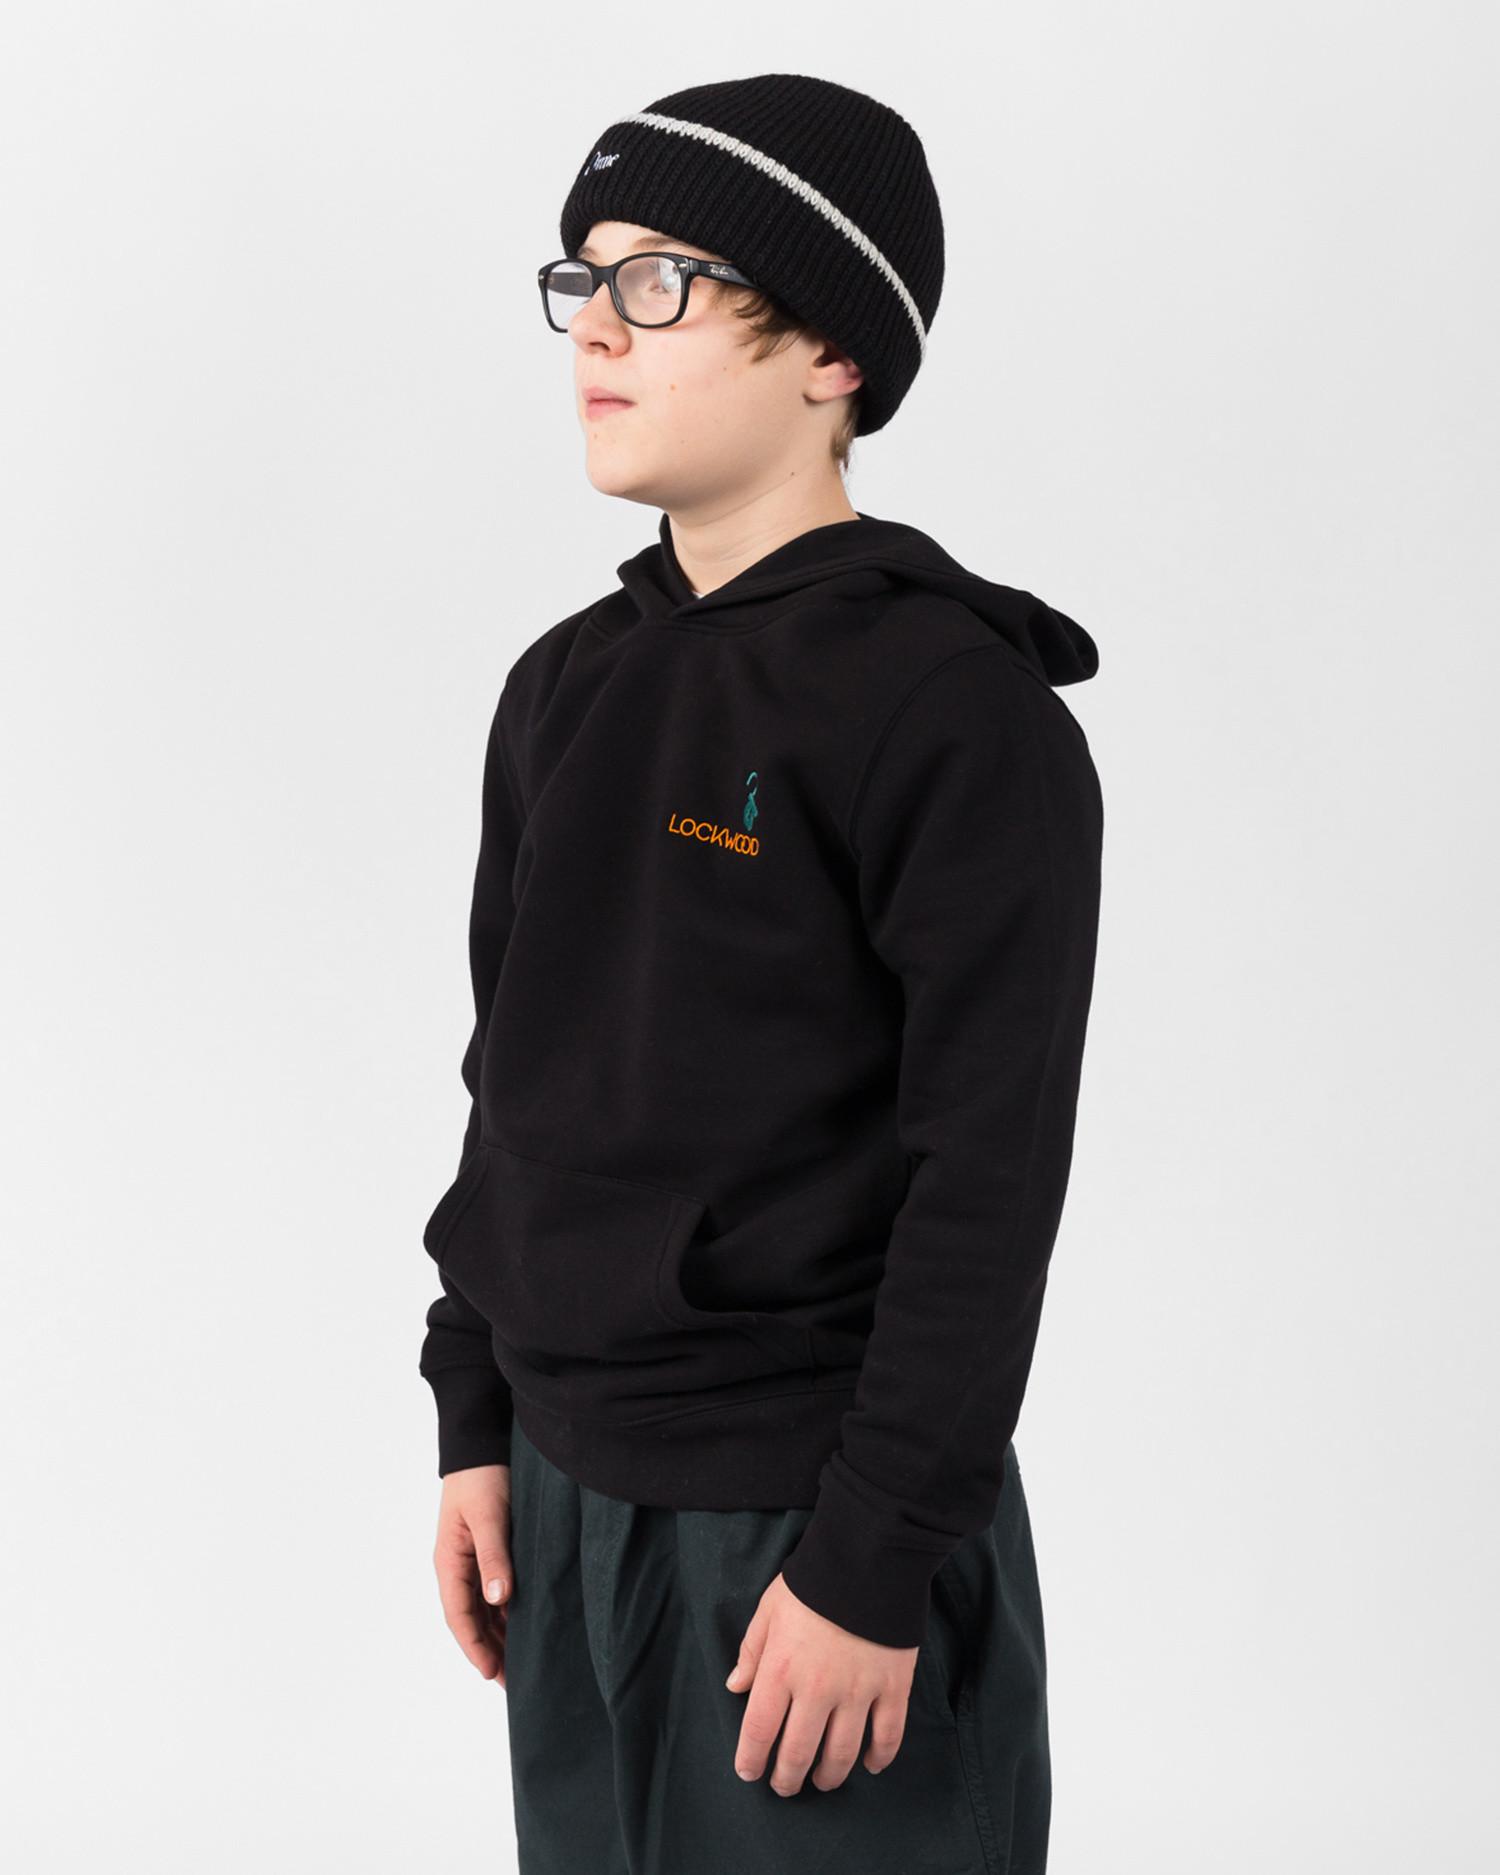 Lockwood Kids Embroidery Hoody Black